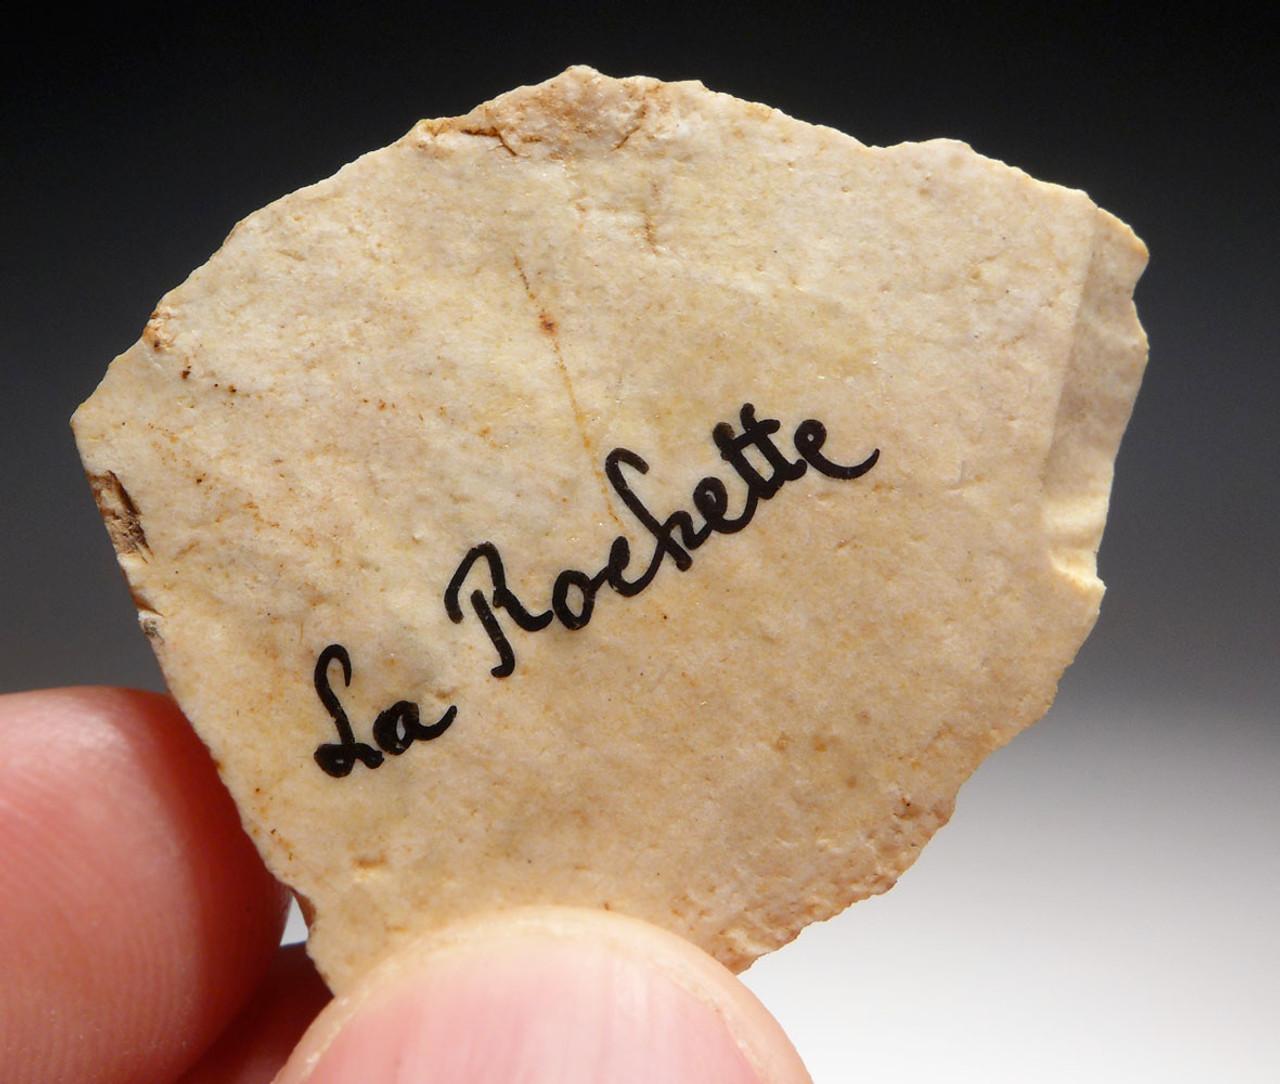 CRO-MAGNON UPPER PALEOLITHIC AURIGNACIAN BURIN ART GRAVER TOOL FROM FAMOUS LA ROCHETTE SITE FRANCE  *UP038